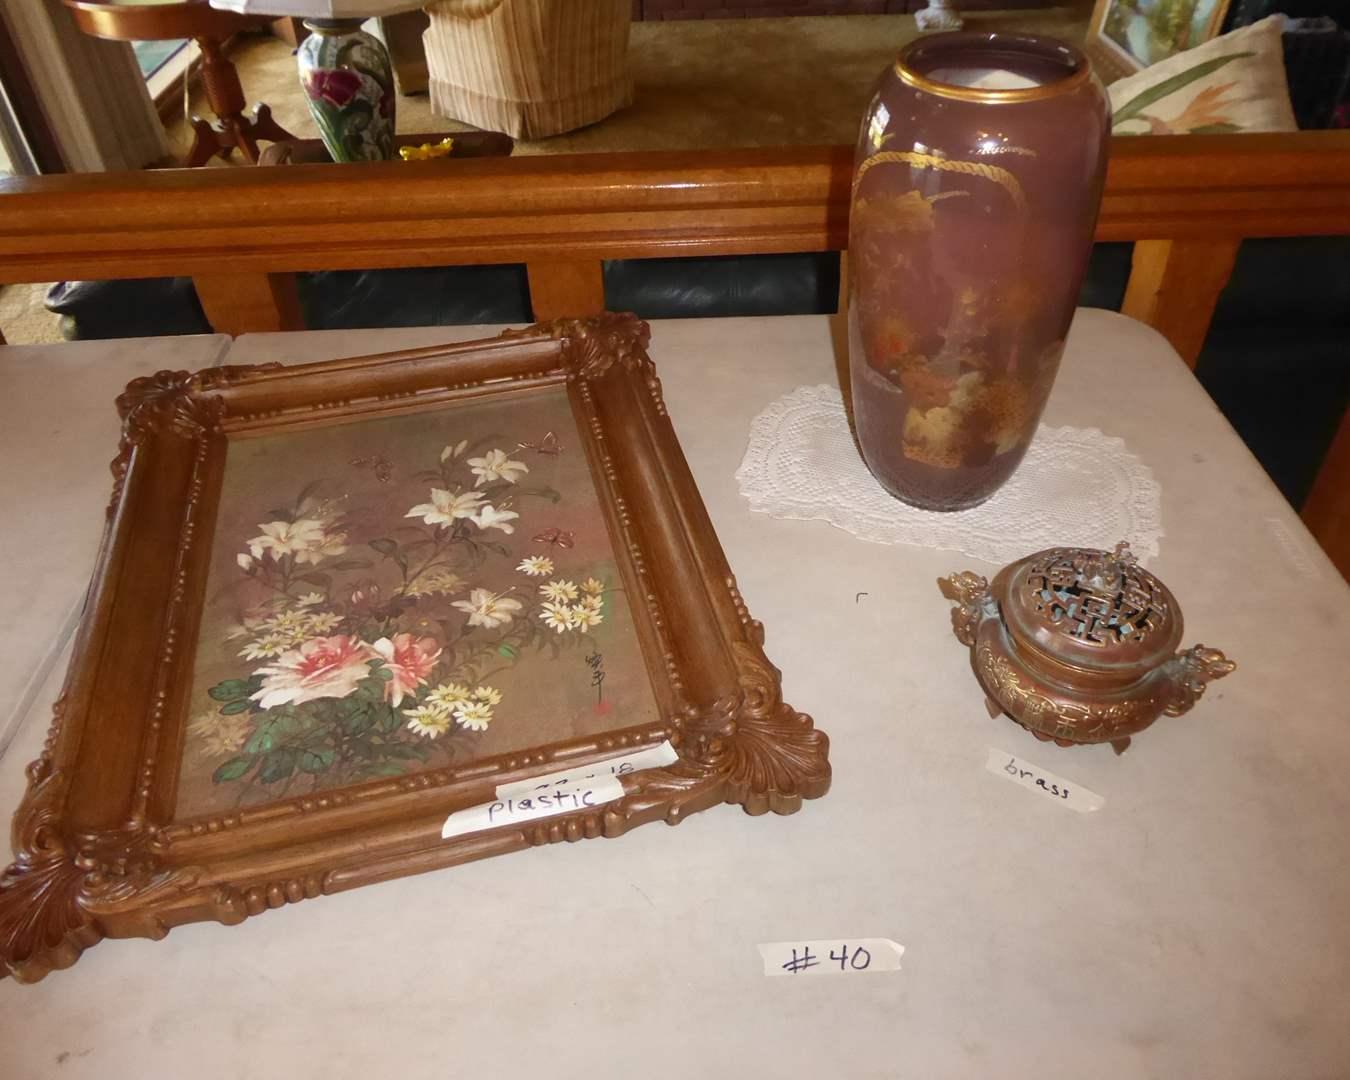 Lot # 40 - Framed Print, Brass Container & Ceramic Vase  (main image)